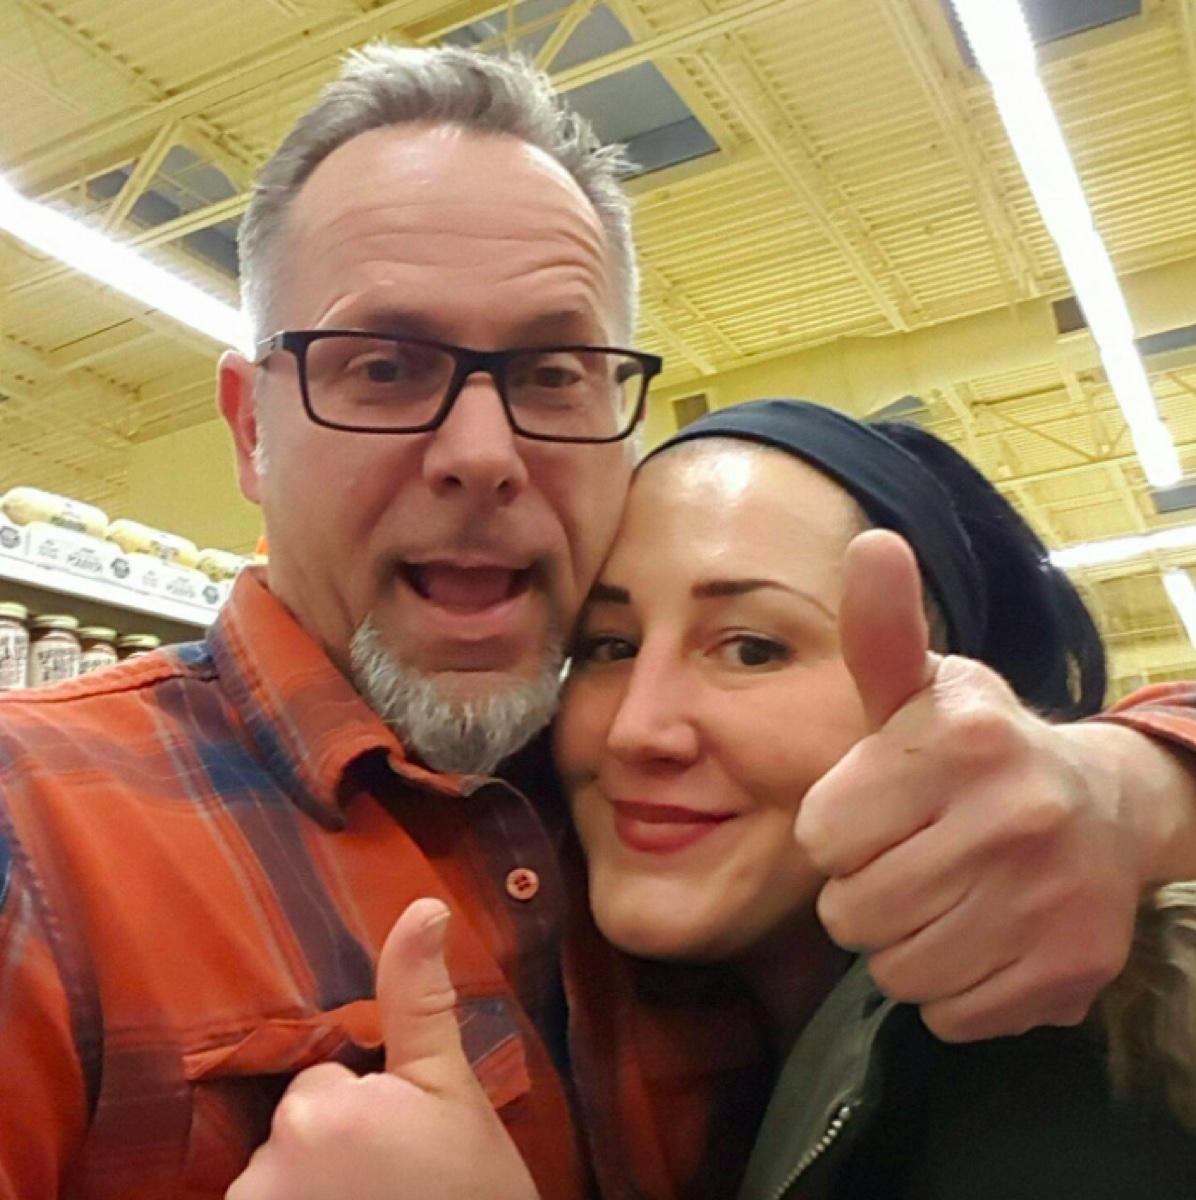 Jeff Stone and wife Christy Novasio